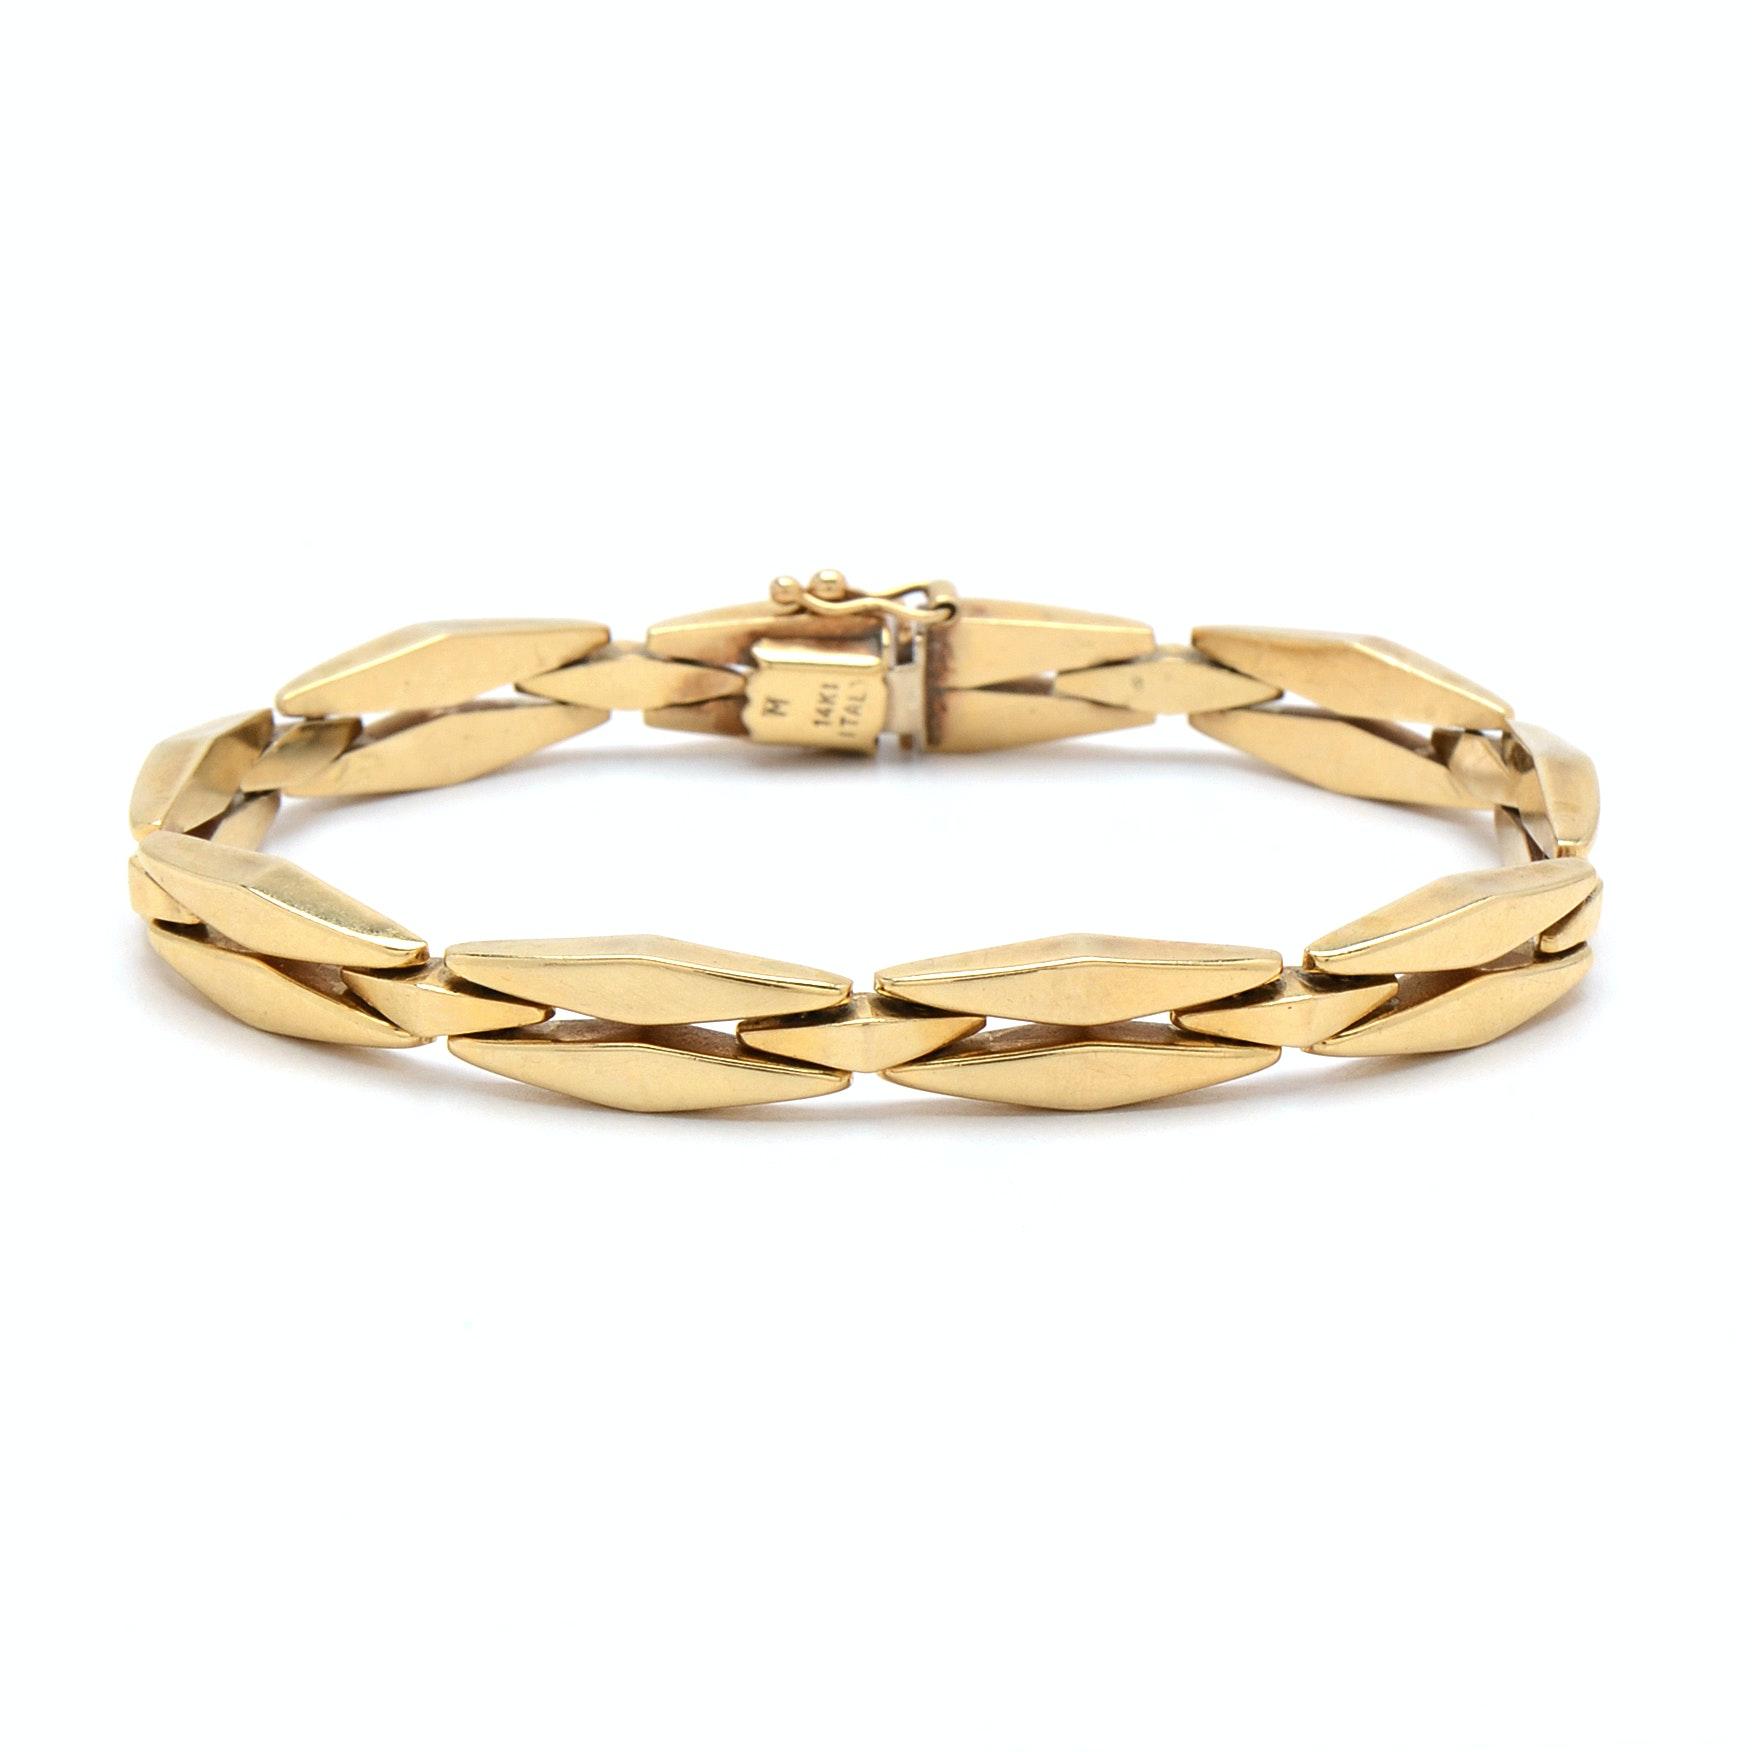 14K Yellow Gold Italian Unique Link Bracelet